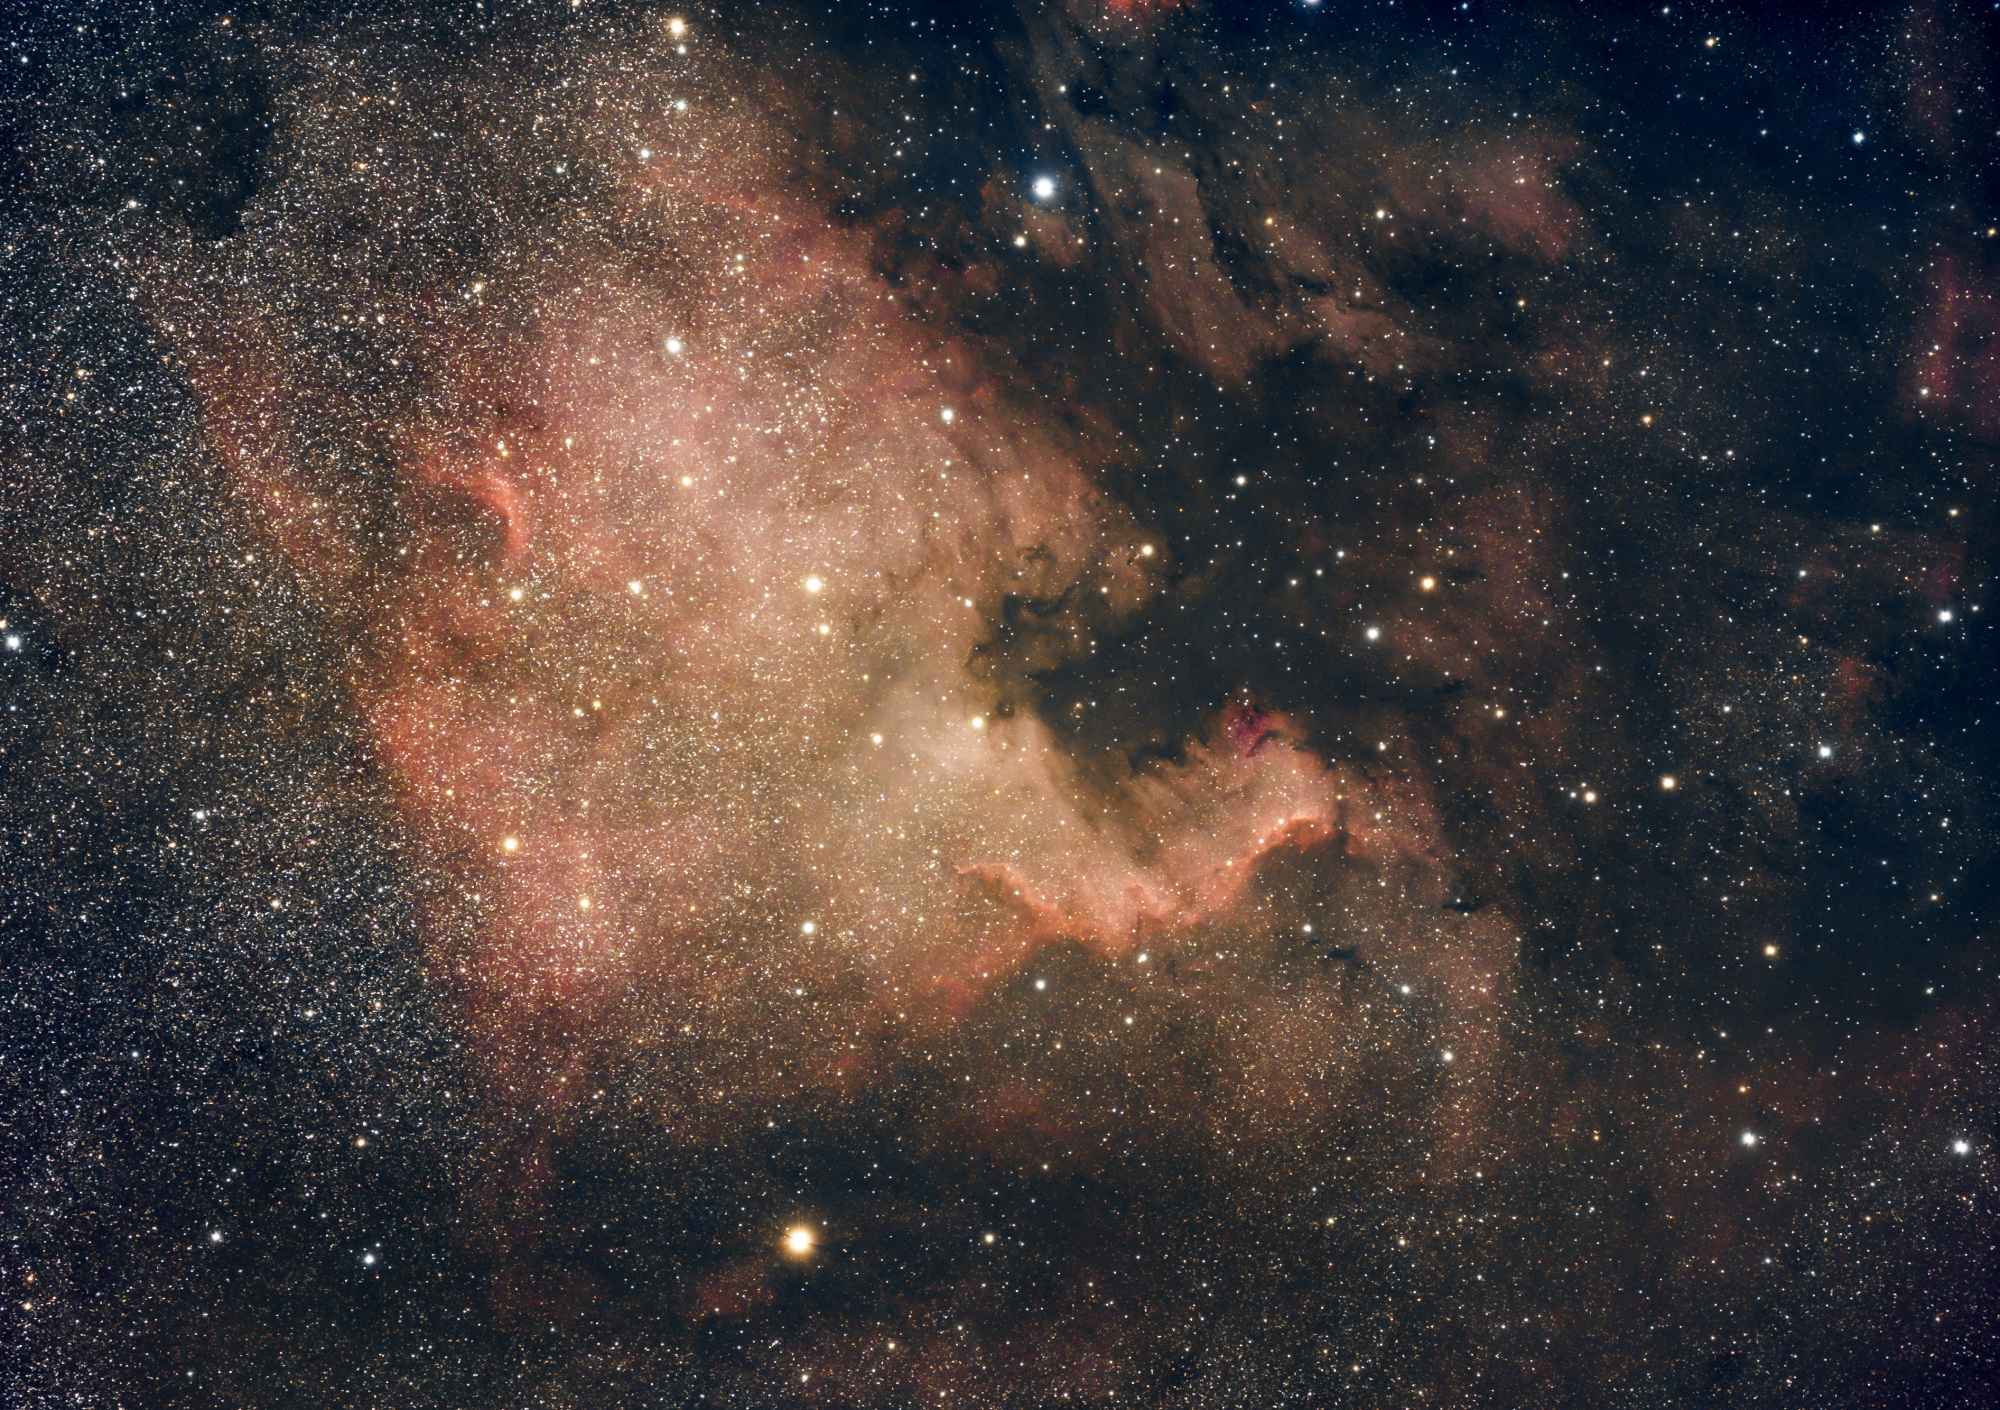 NGC7000_FSQ85_a7s.thumb.jpg.490bdf71b7d9b445ff2726835eeedbe6.jpg